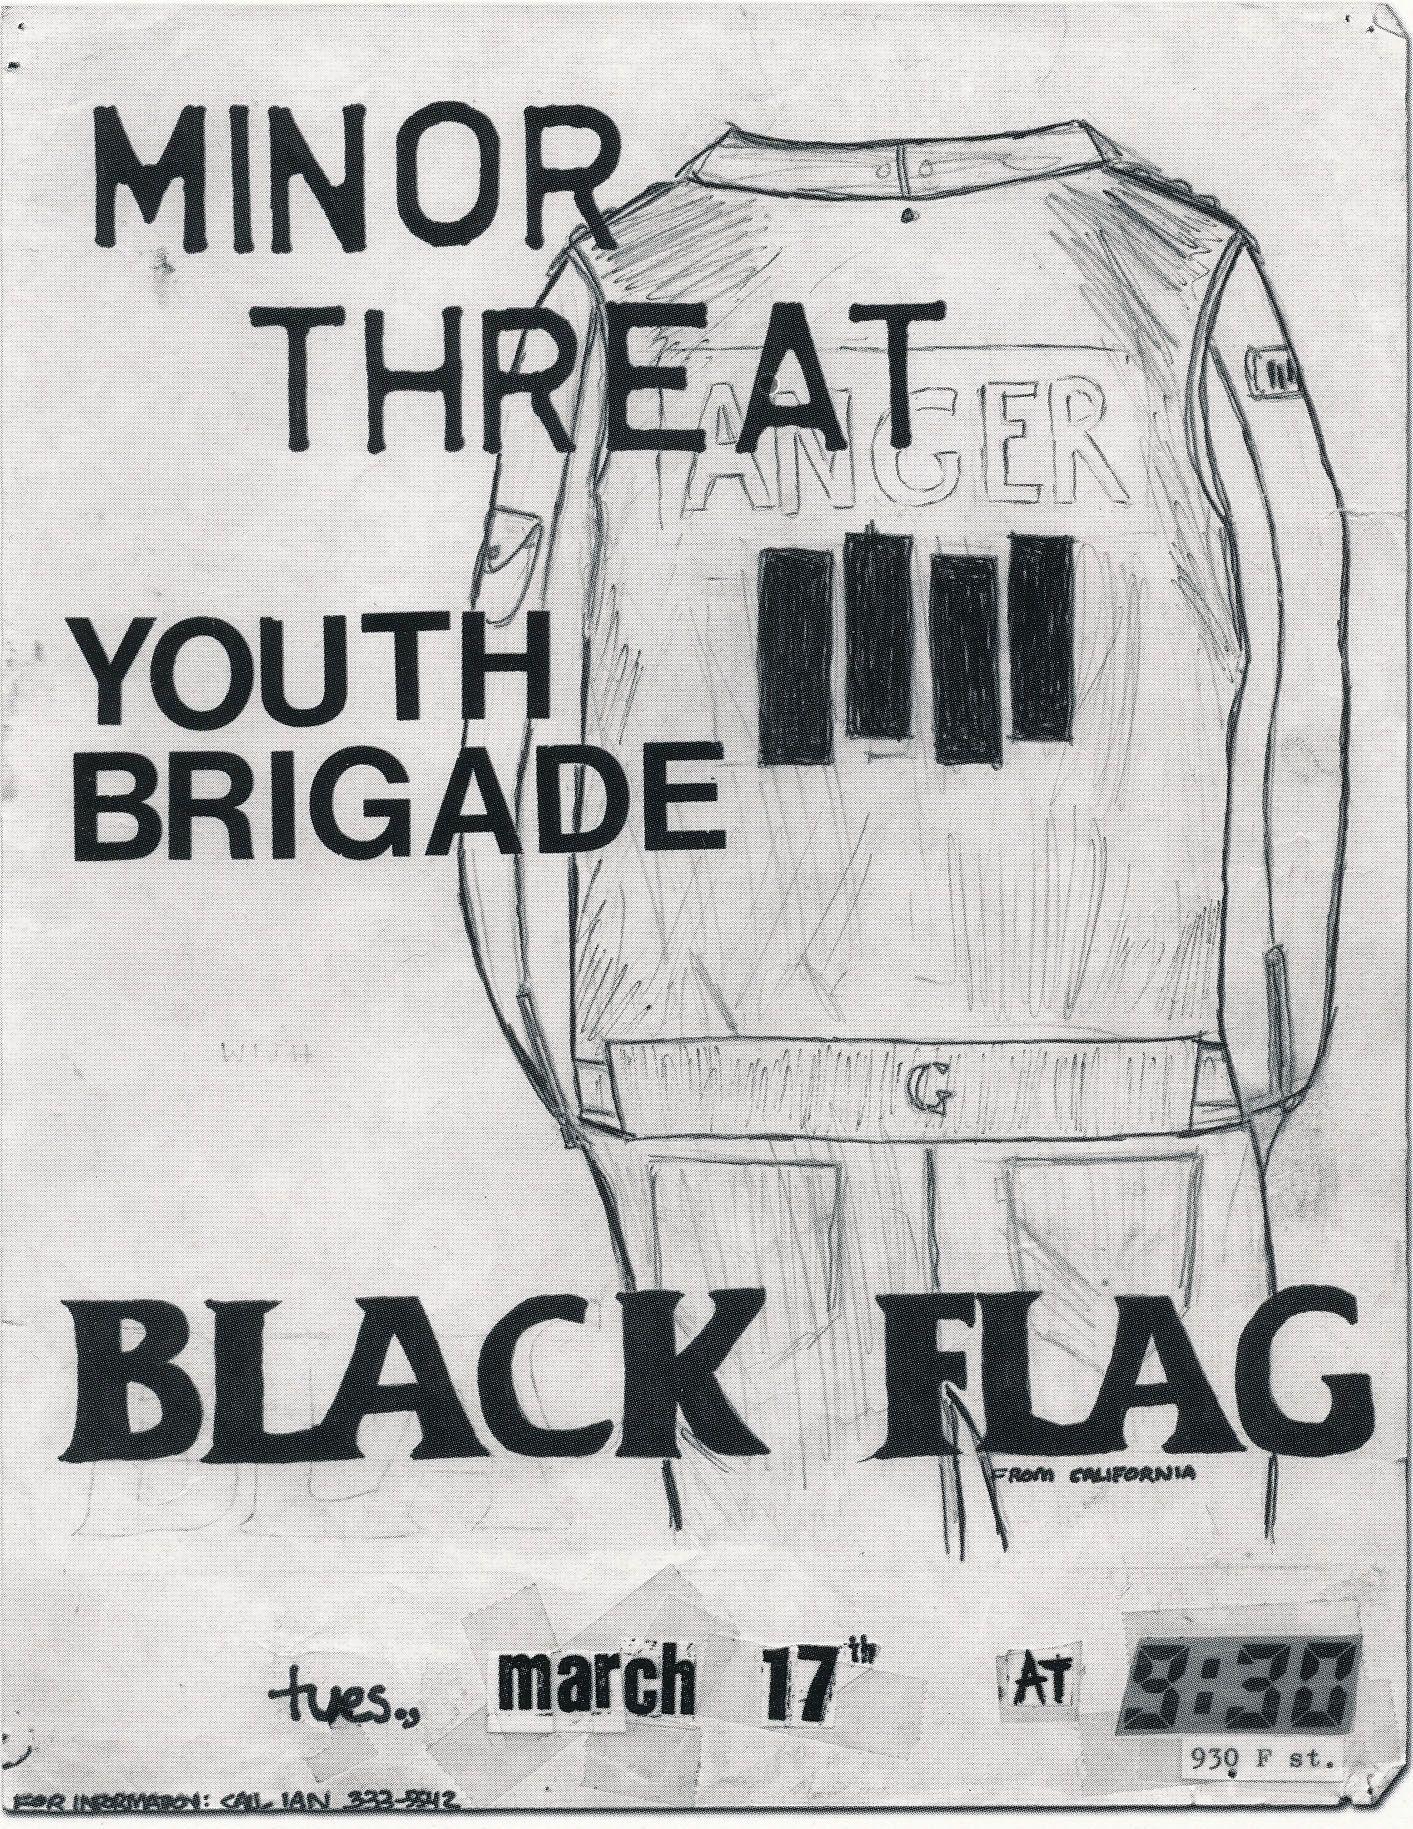 95ba495e9 Minor Threat Black Flag